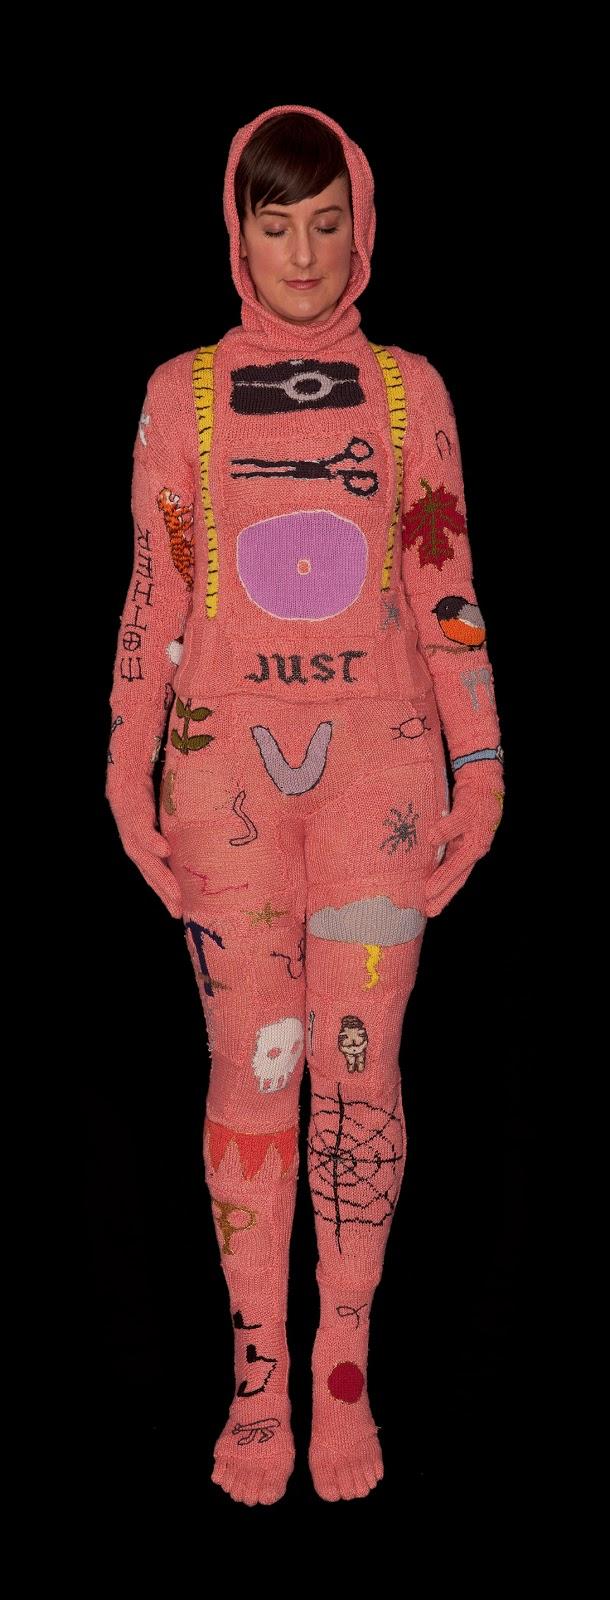 21 Kate+Just+Burial+Suit+Press+Web+image.jpg